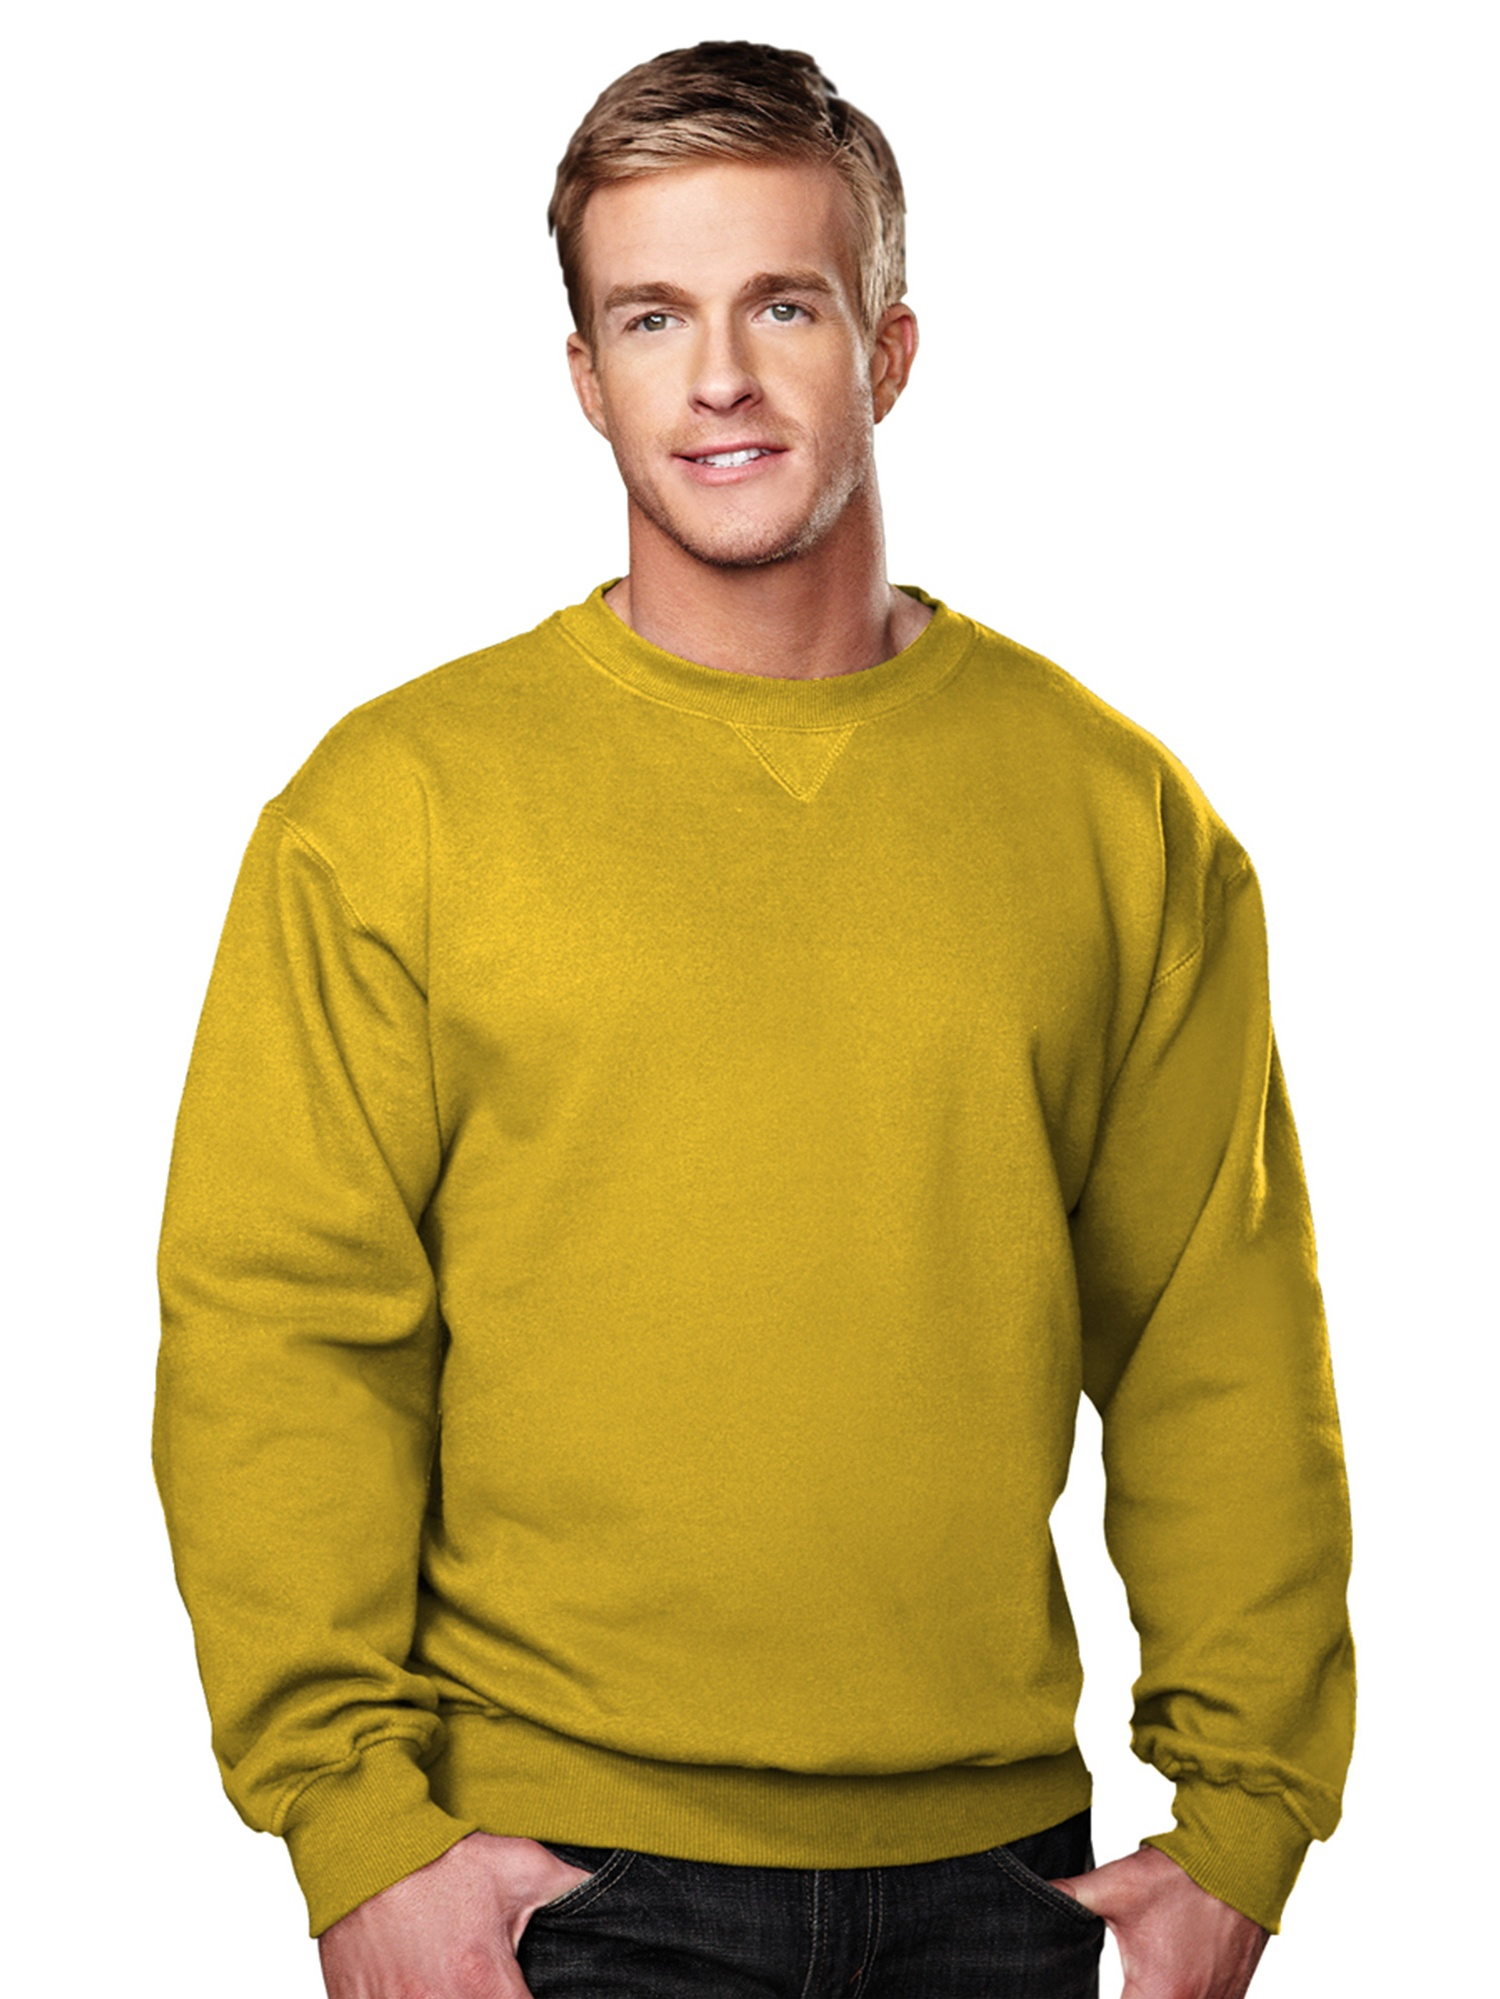 Tri-Mountain Men's Big And Tall V Patch Crewneck Sweatshirt